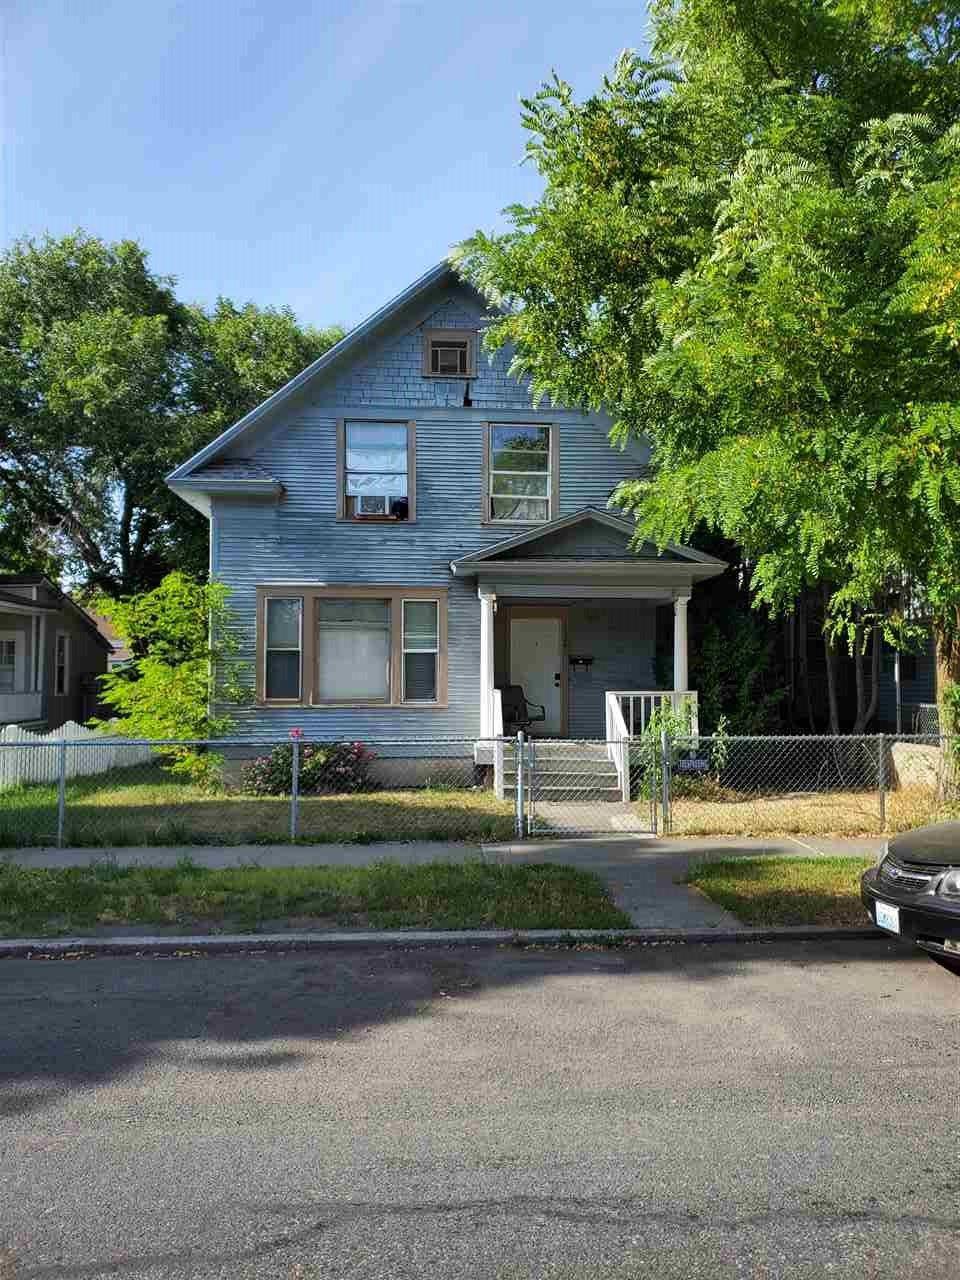 1724 W GARDNER Ave, Spokane, WA 99201 - #: 202018779